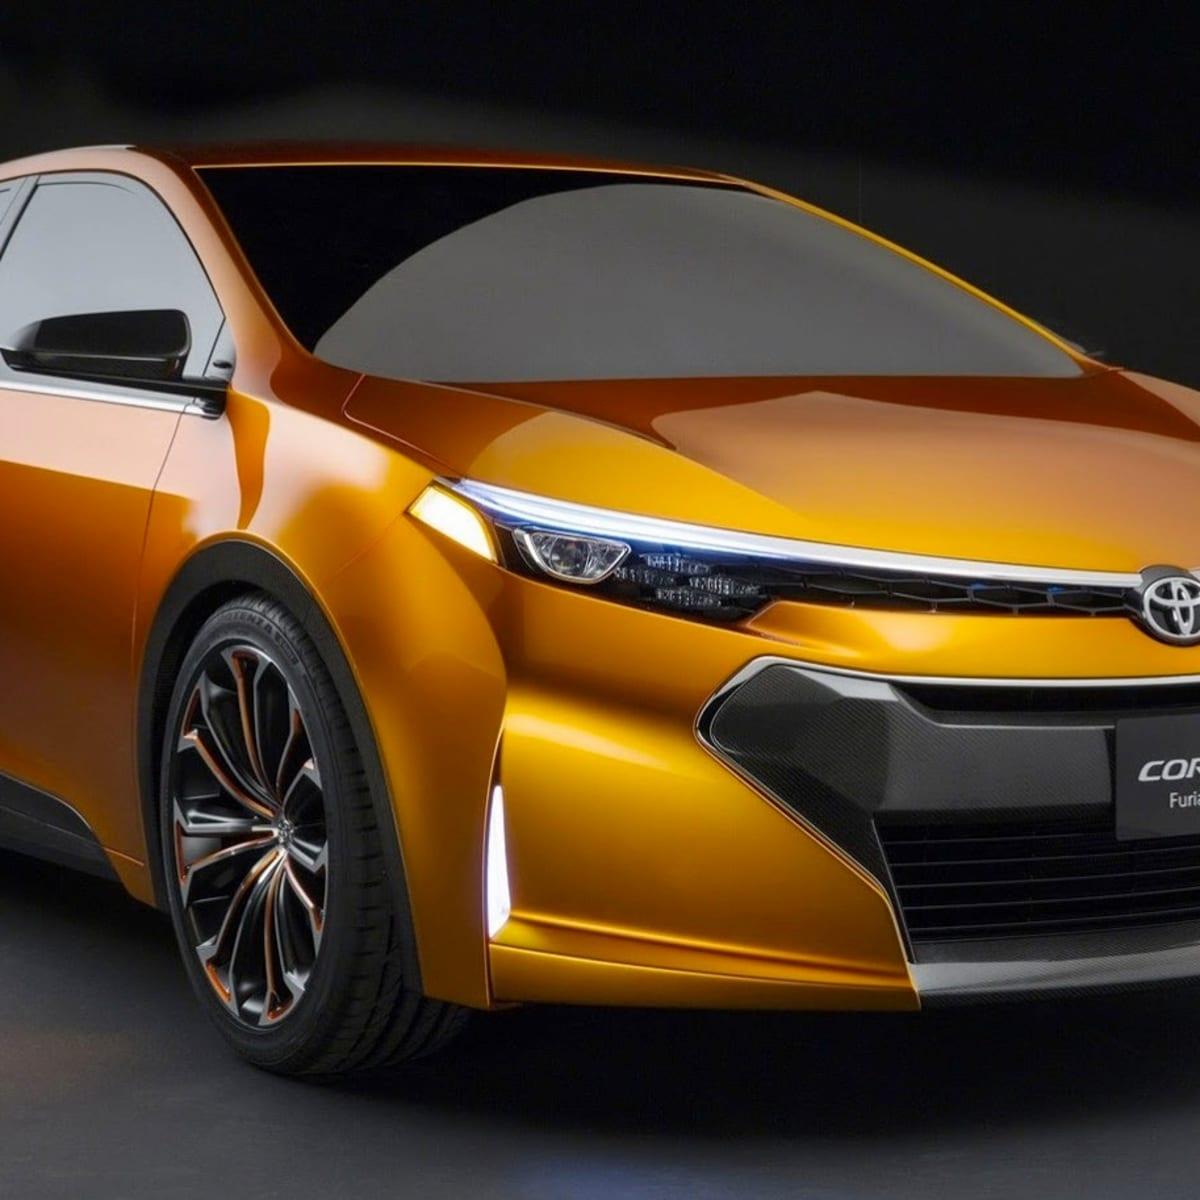 3a13a54511b432 Toyota Corolla Furia concept previews new small sedan | CarAdvice